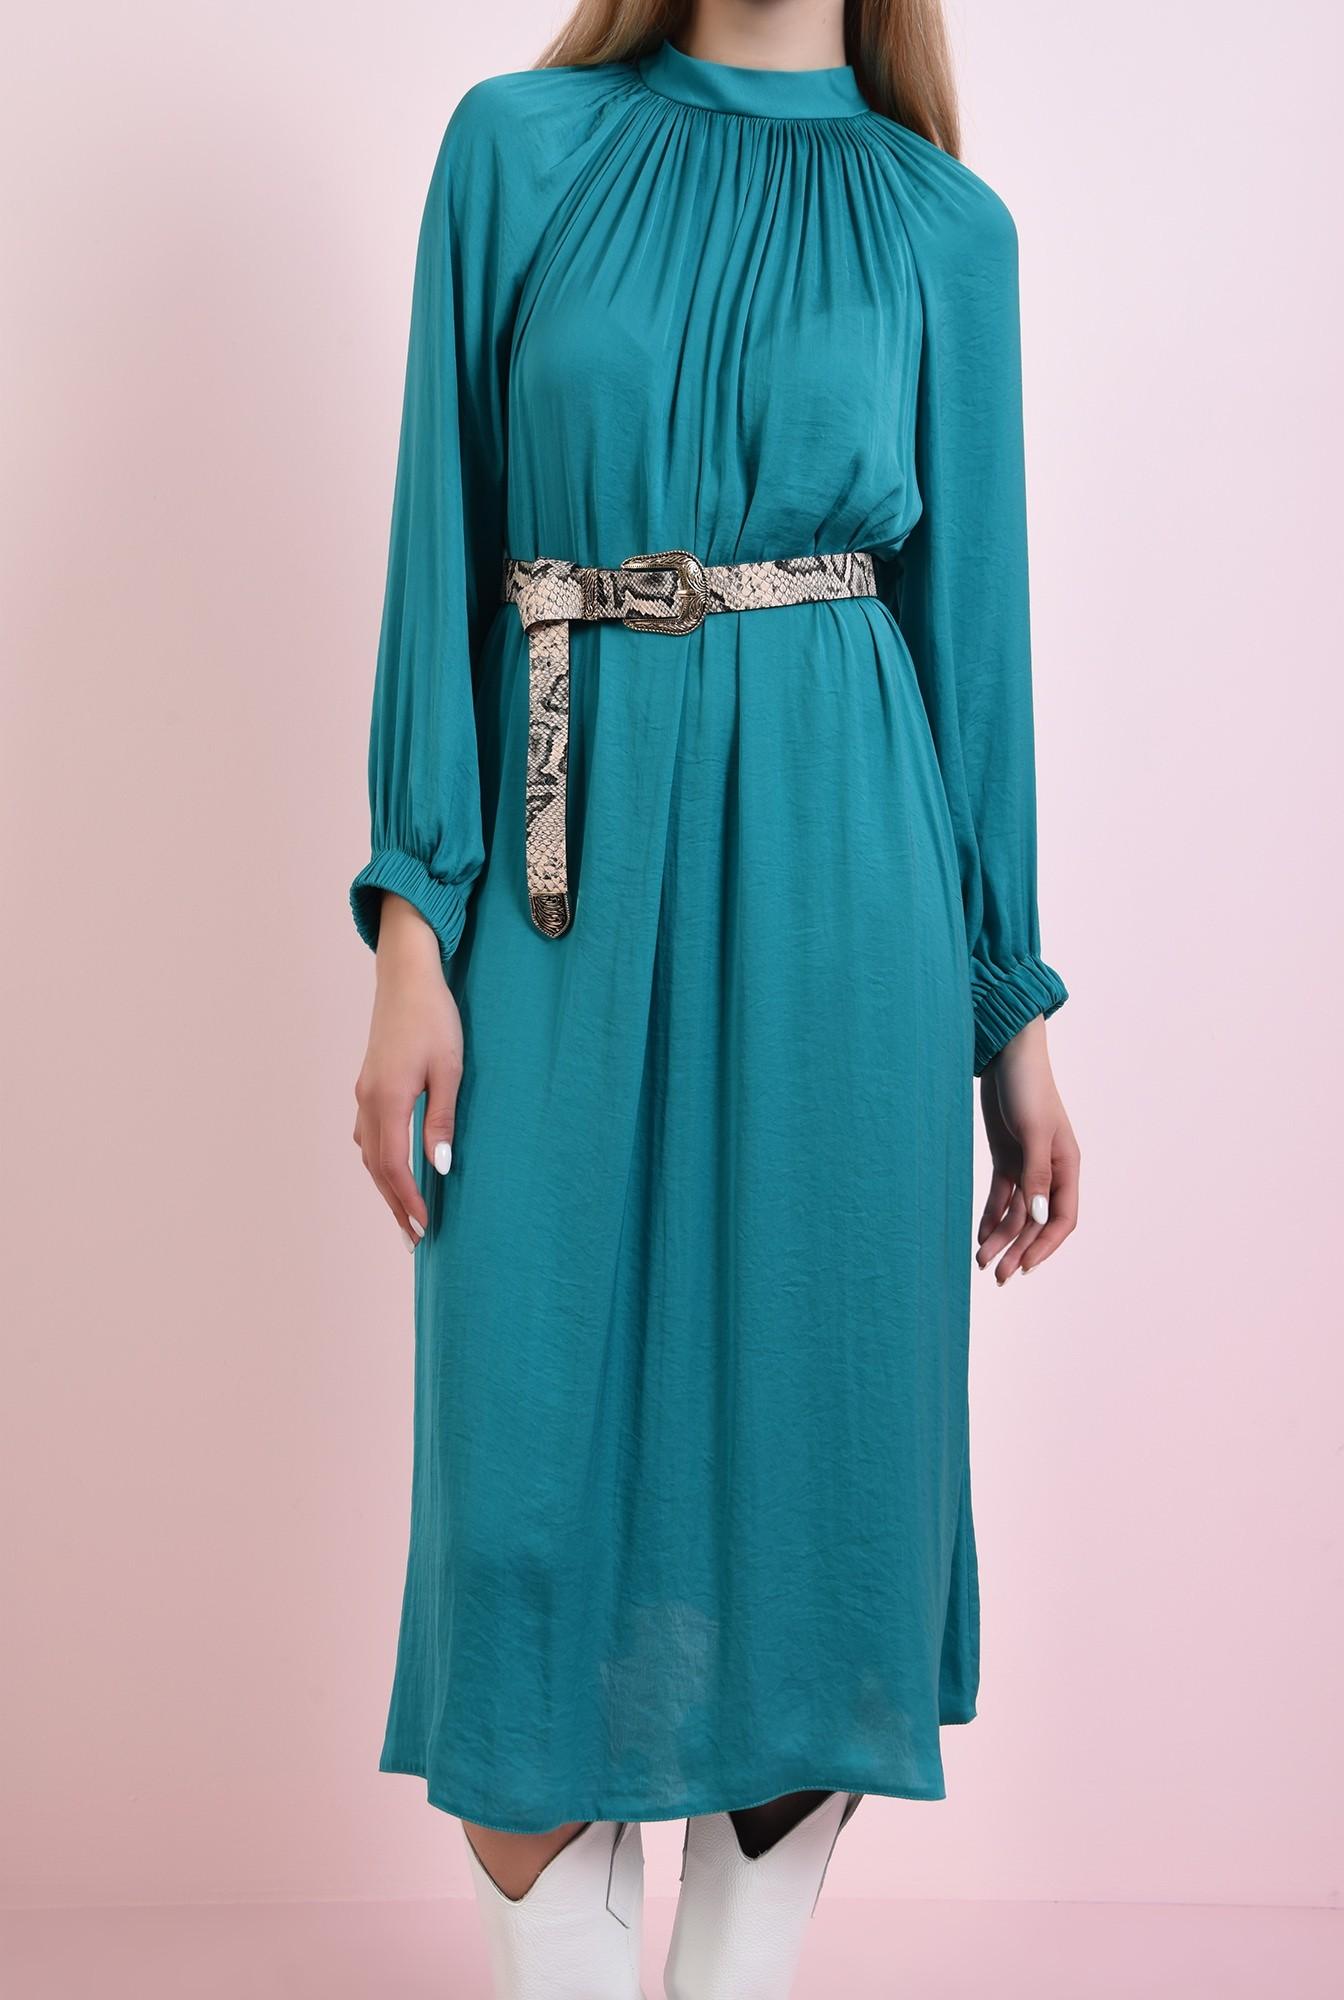 0 - 360 - rochie midi, verde, din satin